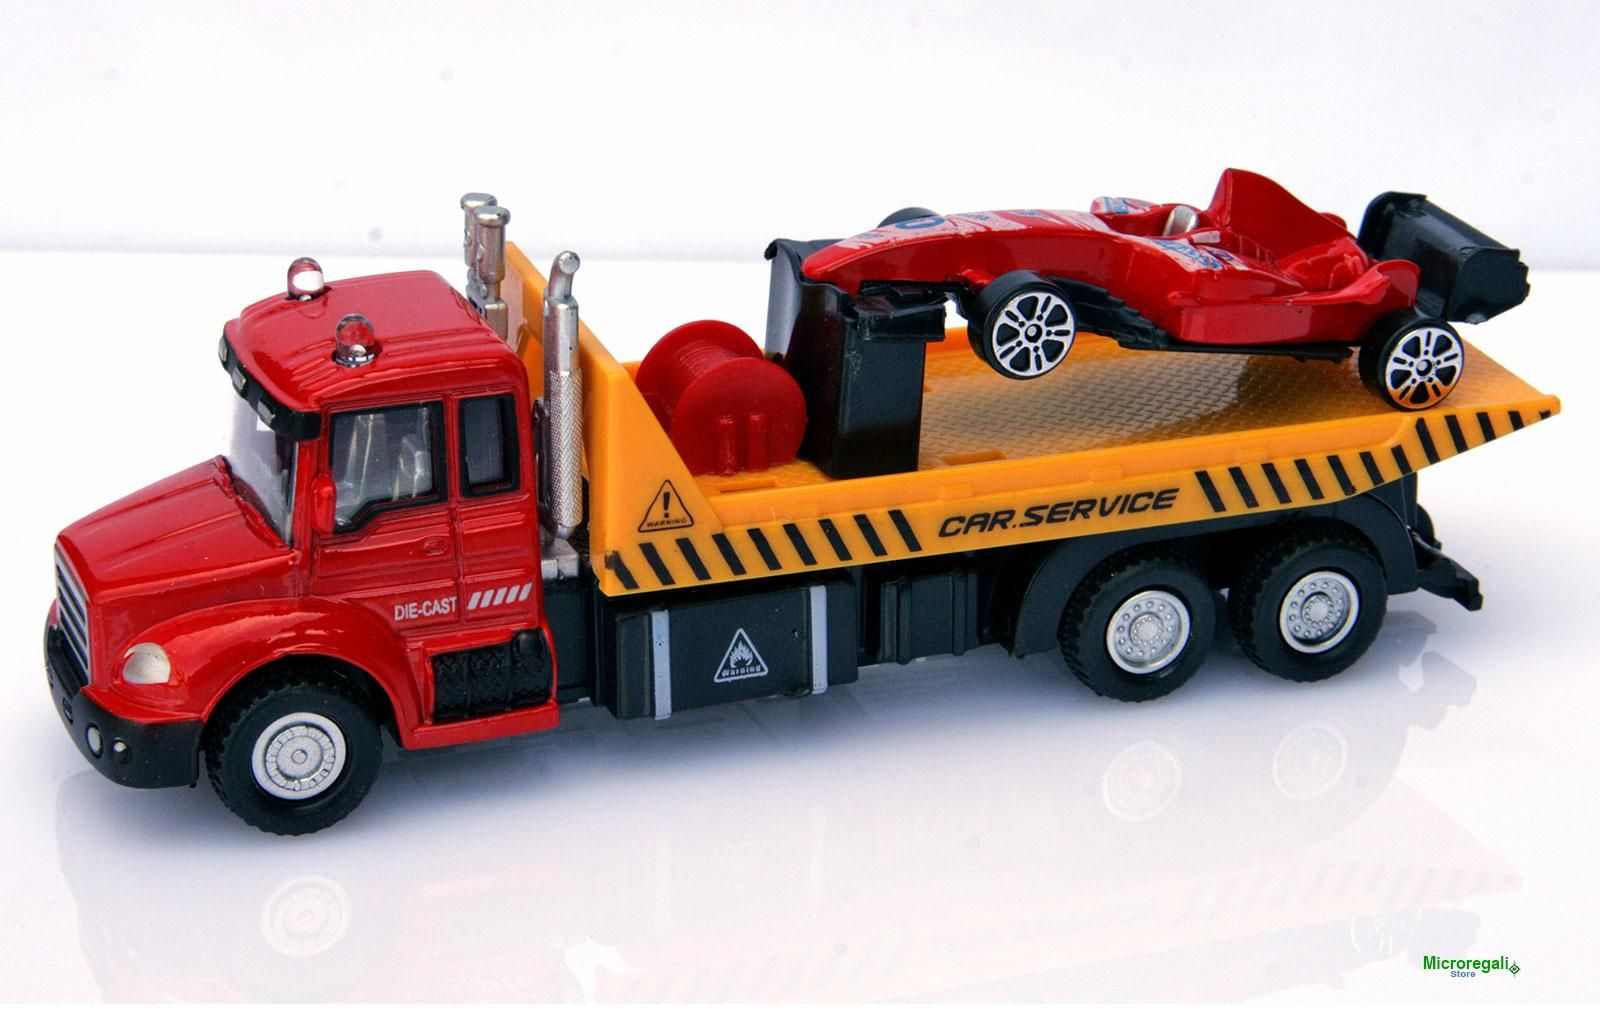 Elicottero Hot Wheels : Camion soccorso con elicottero metallo die cast cm